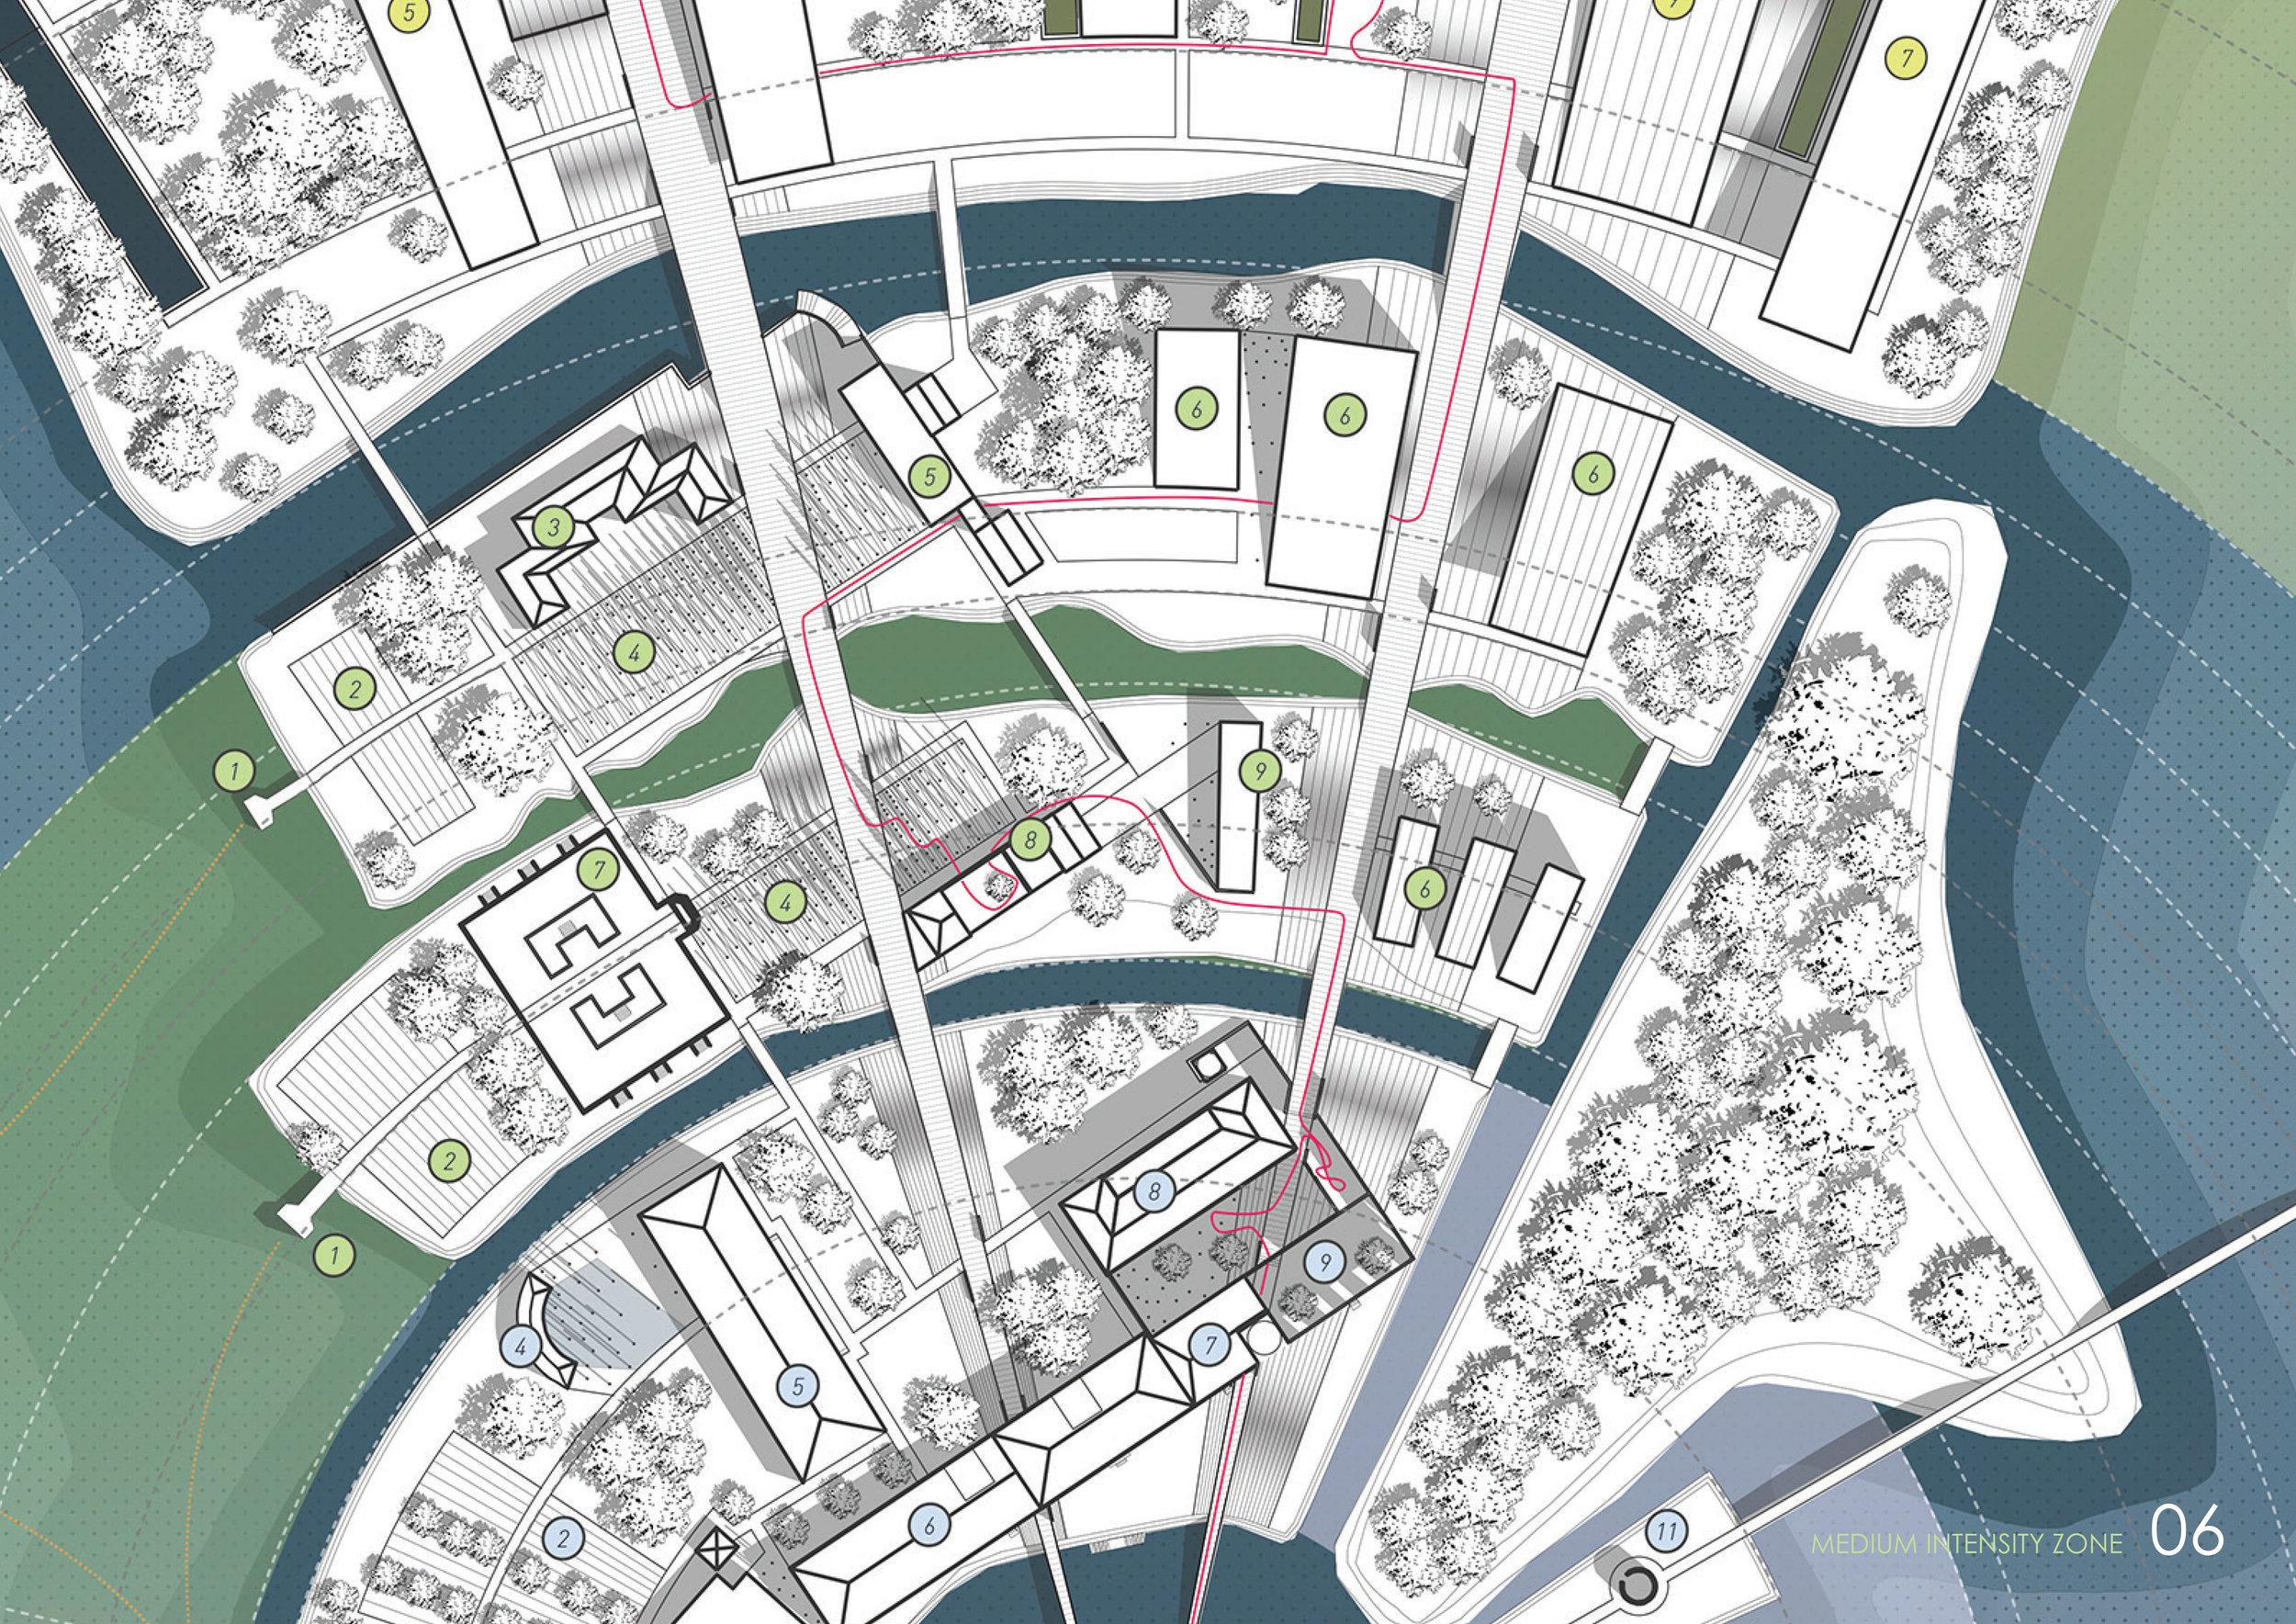 Univeristy Island Gradient Matt Fajkus Architecture MF MFx16_6.jpg